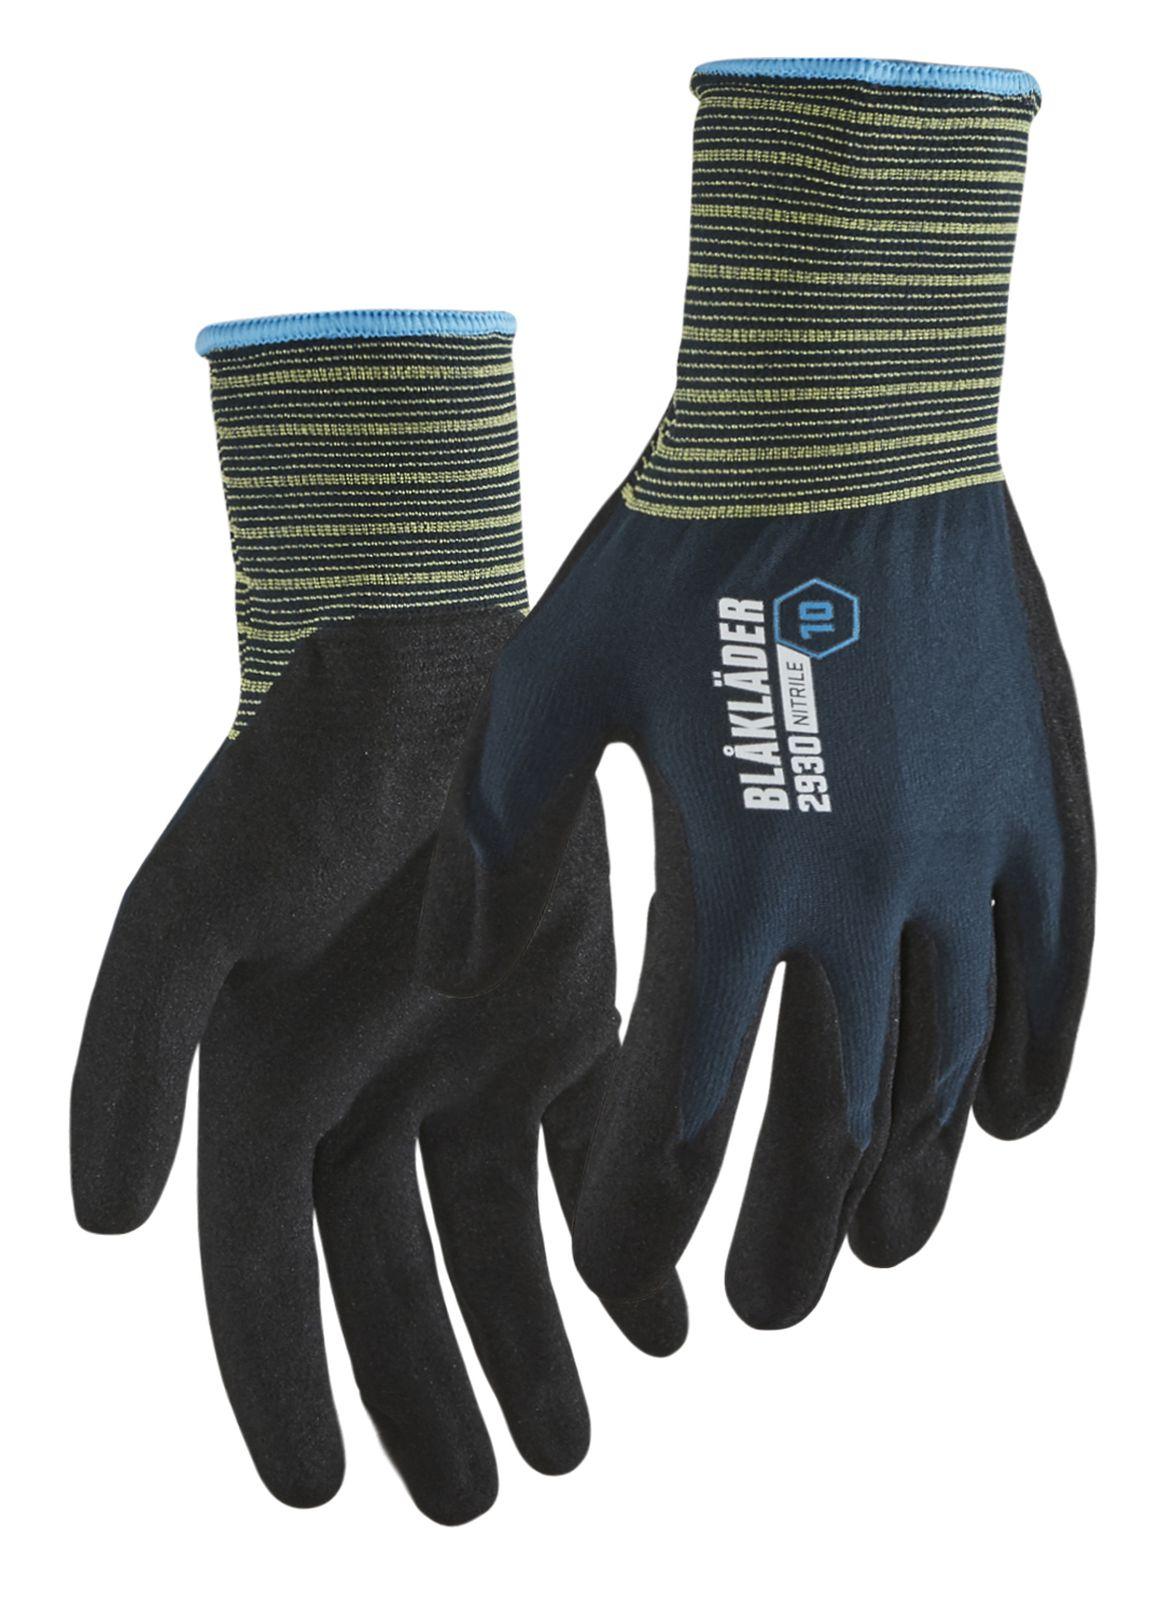 Blaklader handschoenen 29301457 donker marineblauw(8600)